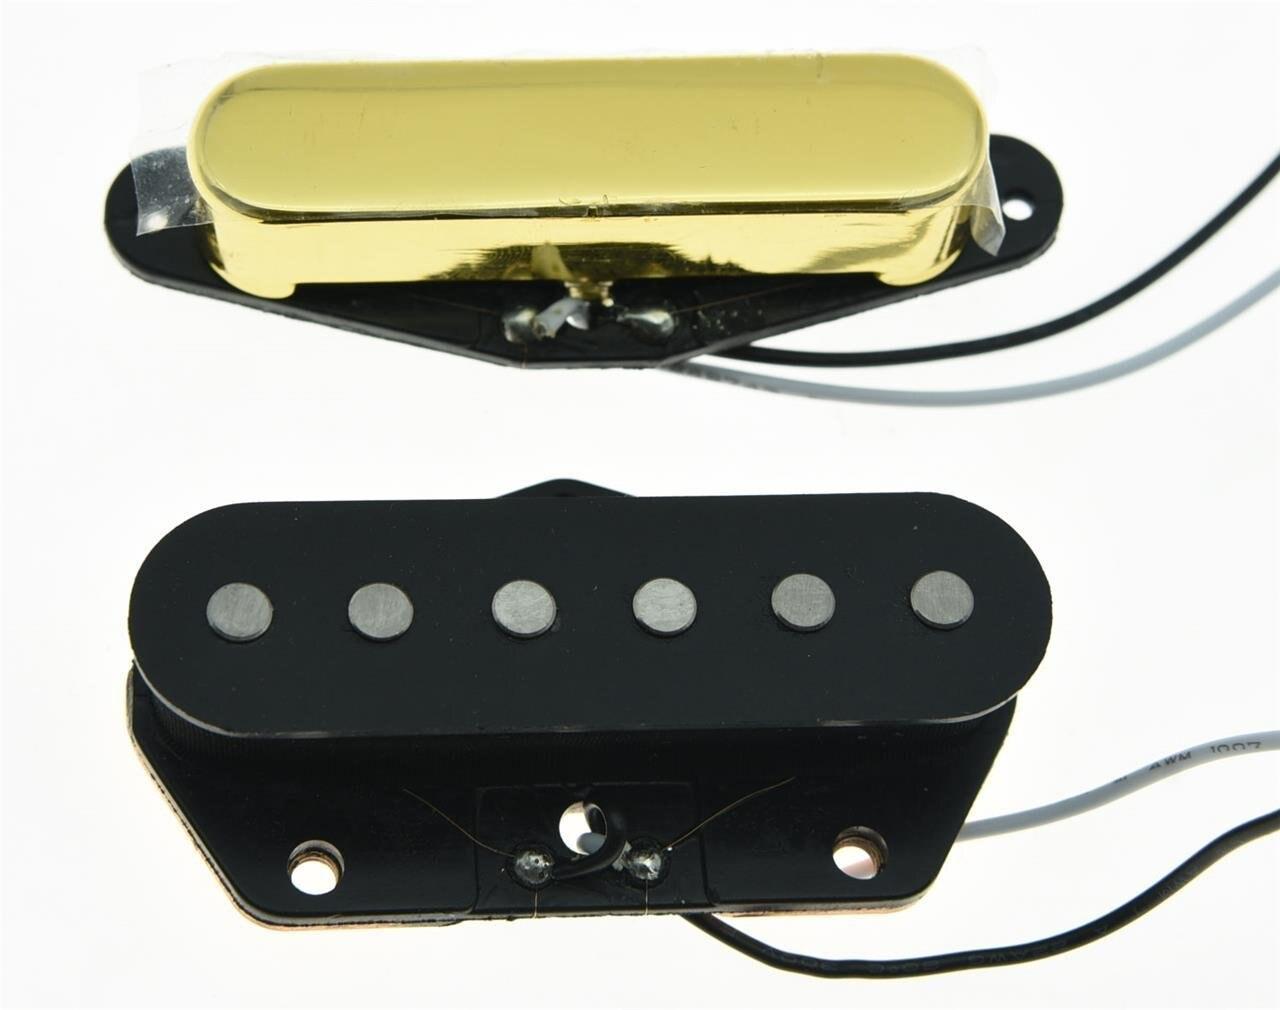 High quality Alnico 5 Tele Neck BRIDGE Pickup 50s Vintage Sound Pickups for Telecaster Gold<br>